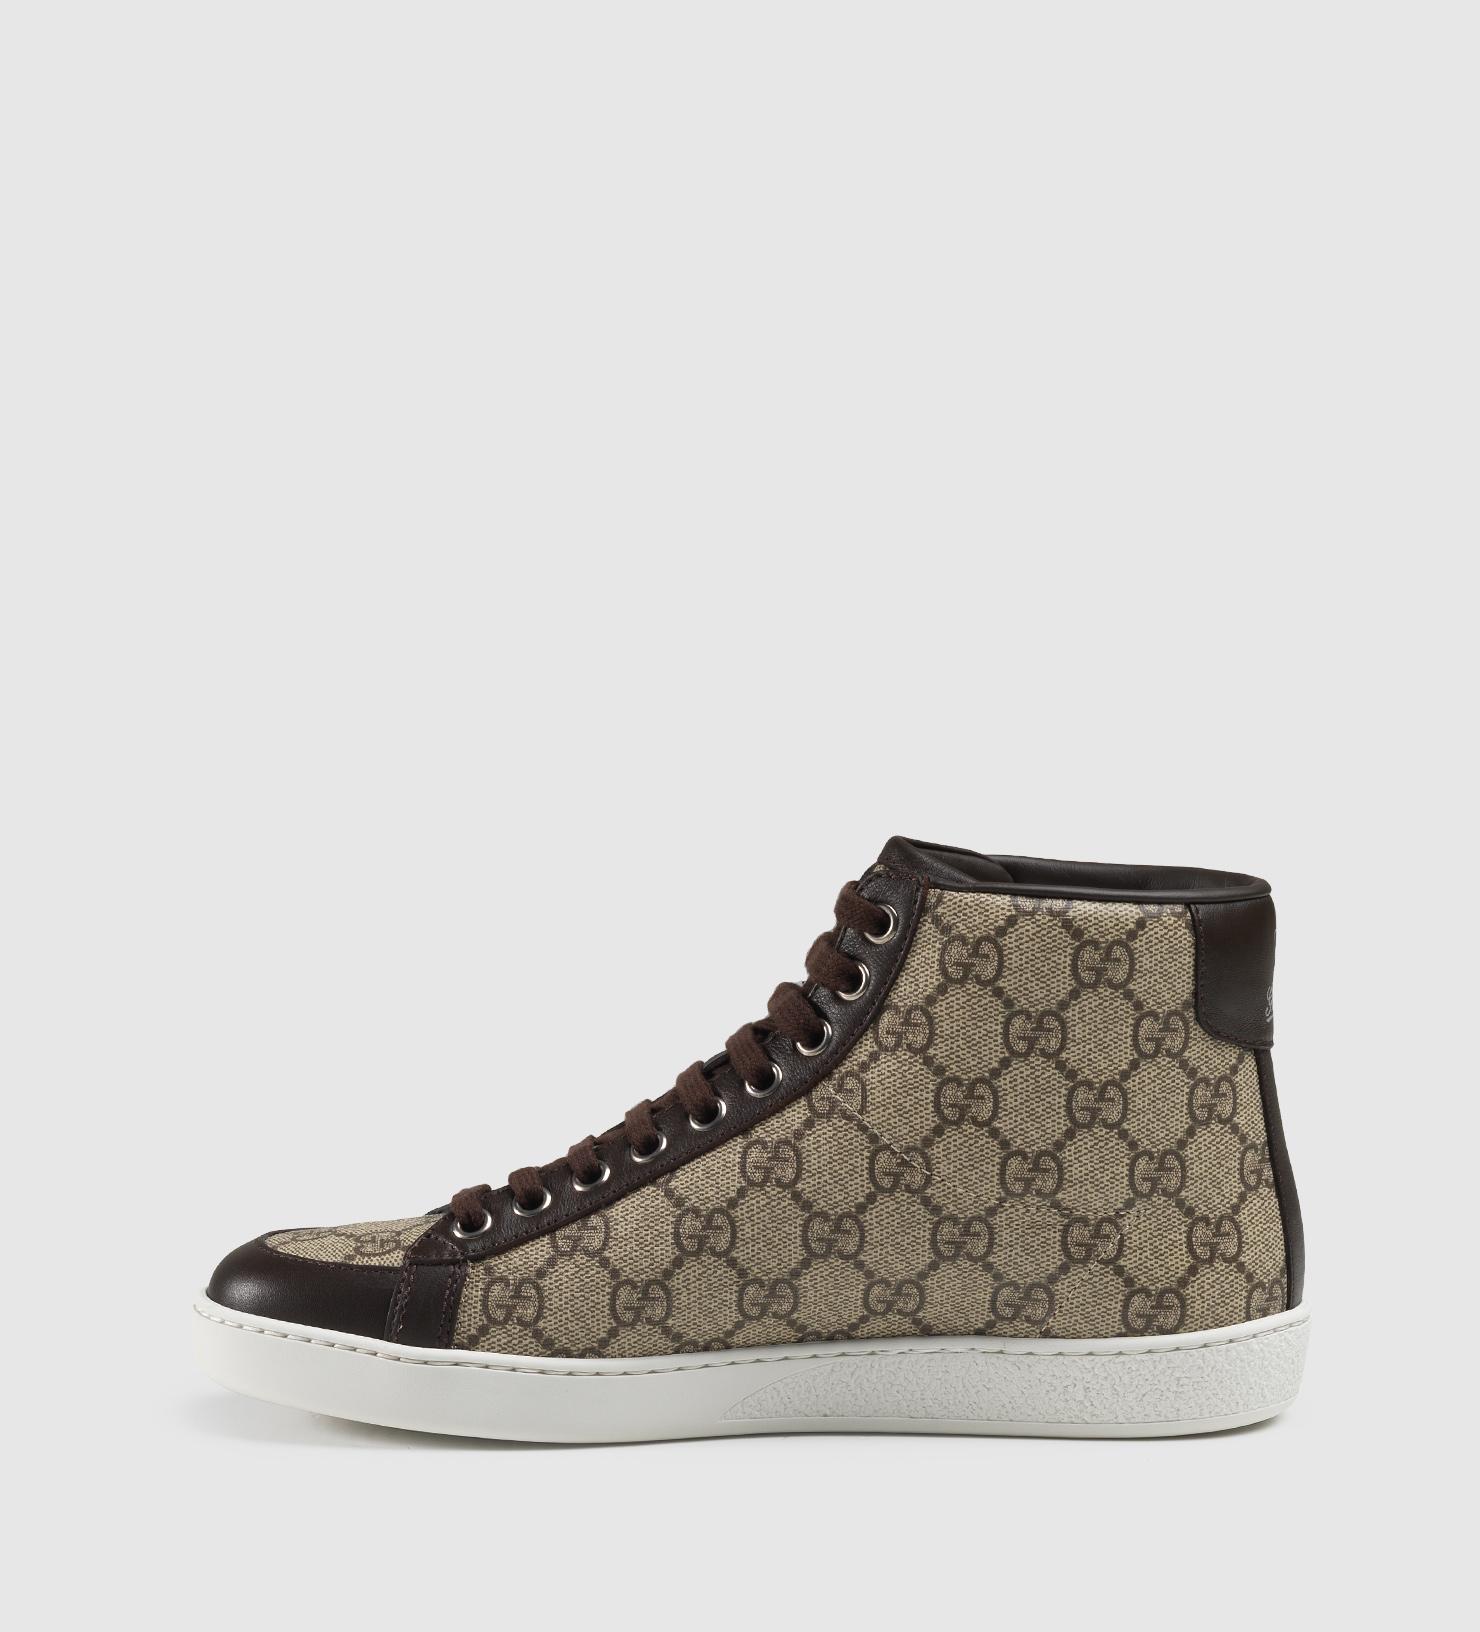 Gucci Brooklyn Gg Supreme Canvas High-top Sneaker in Black - Lyst acc90859d